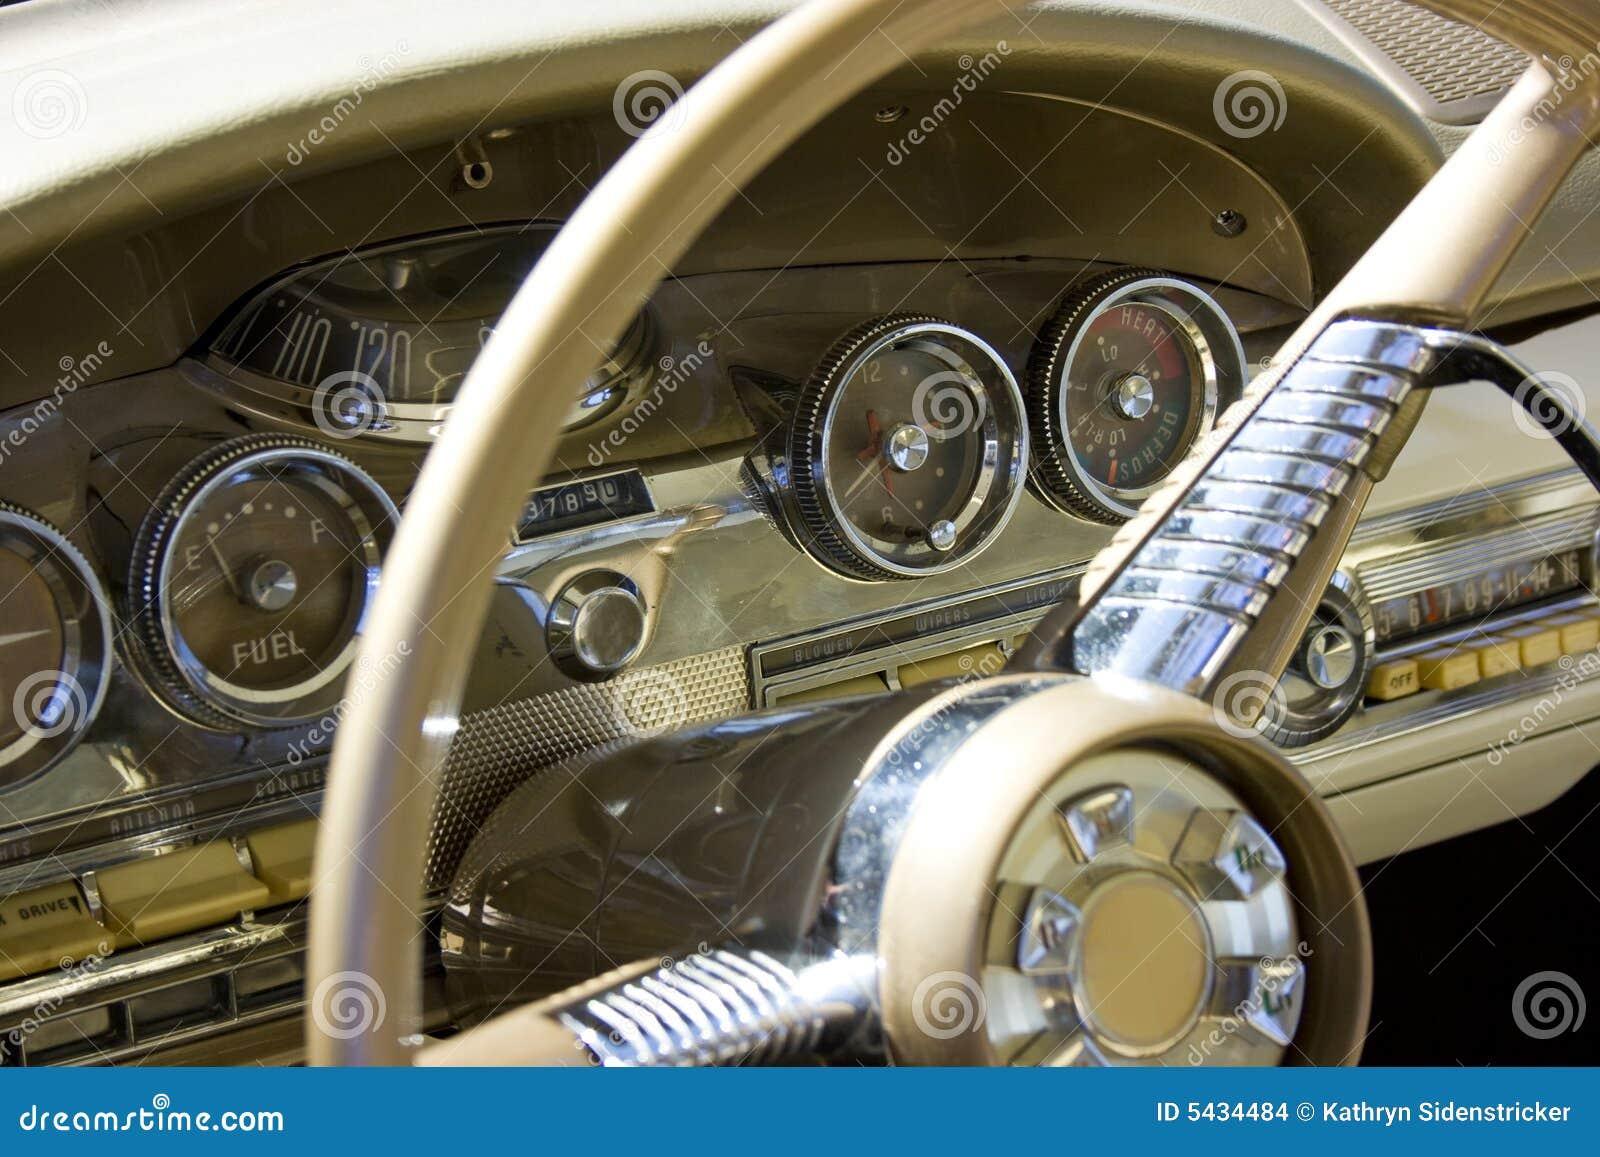 1958 dash edsel ford steering wheel